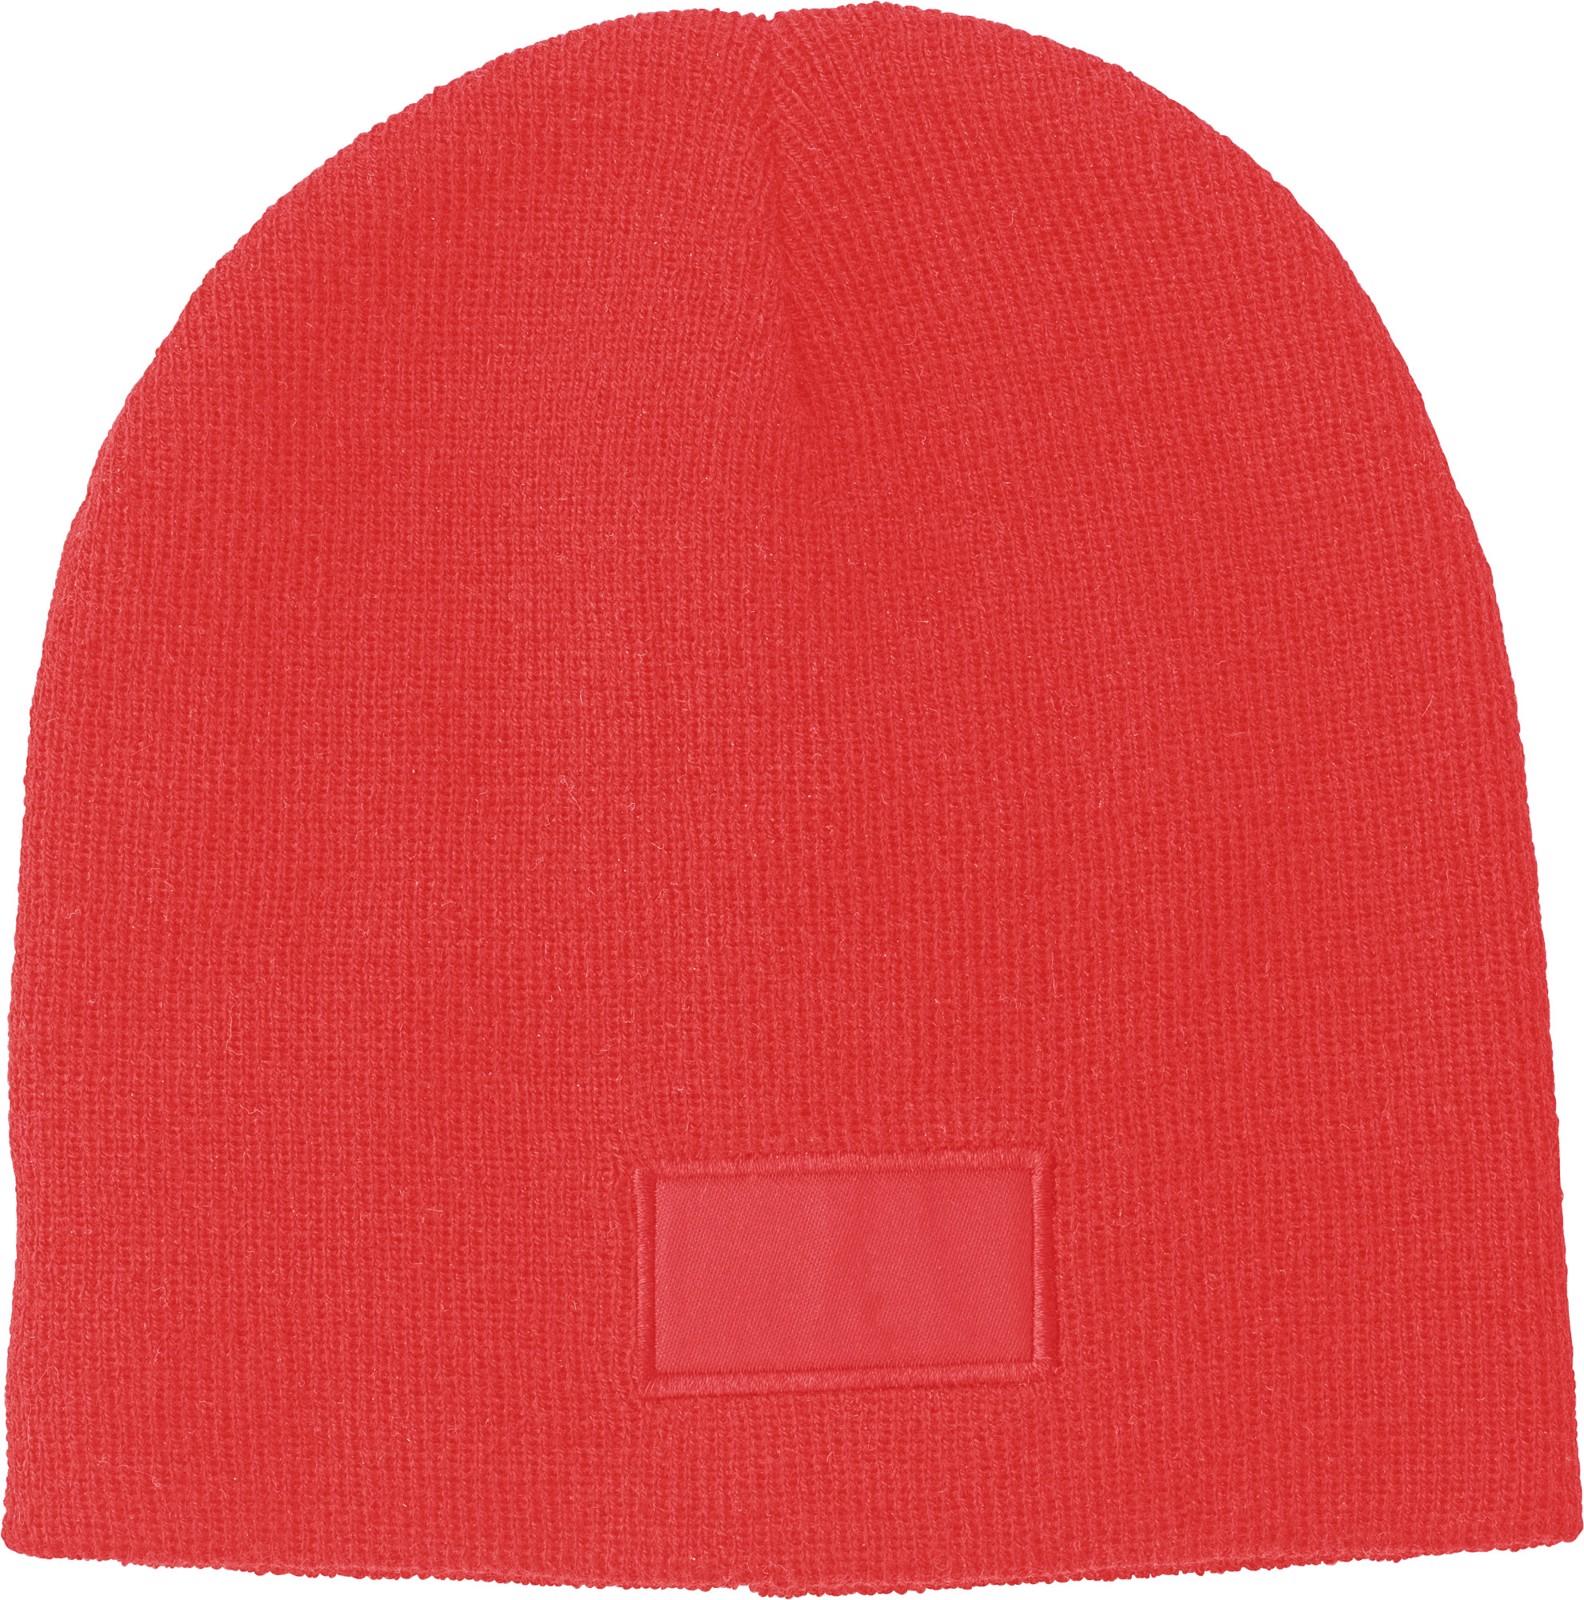 Acrylic beanie - Red